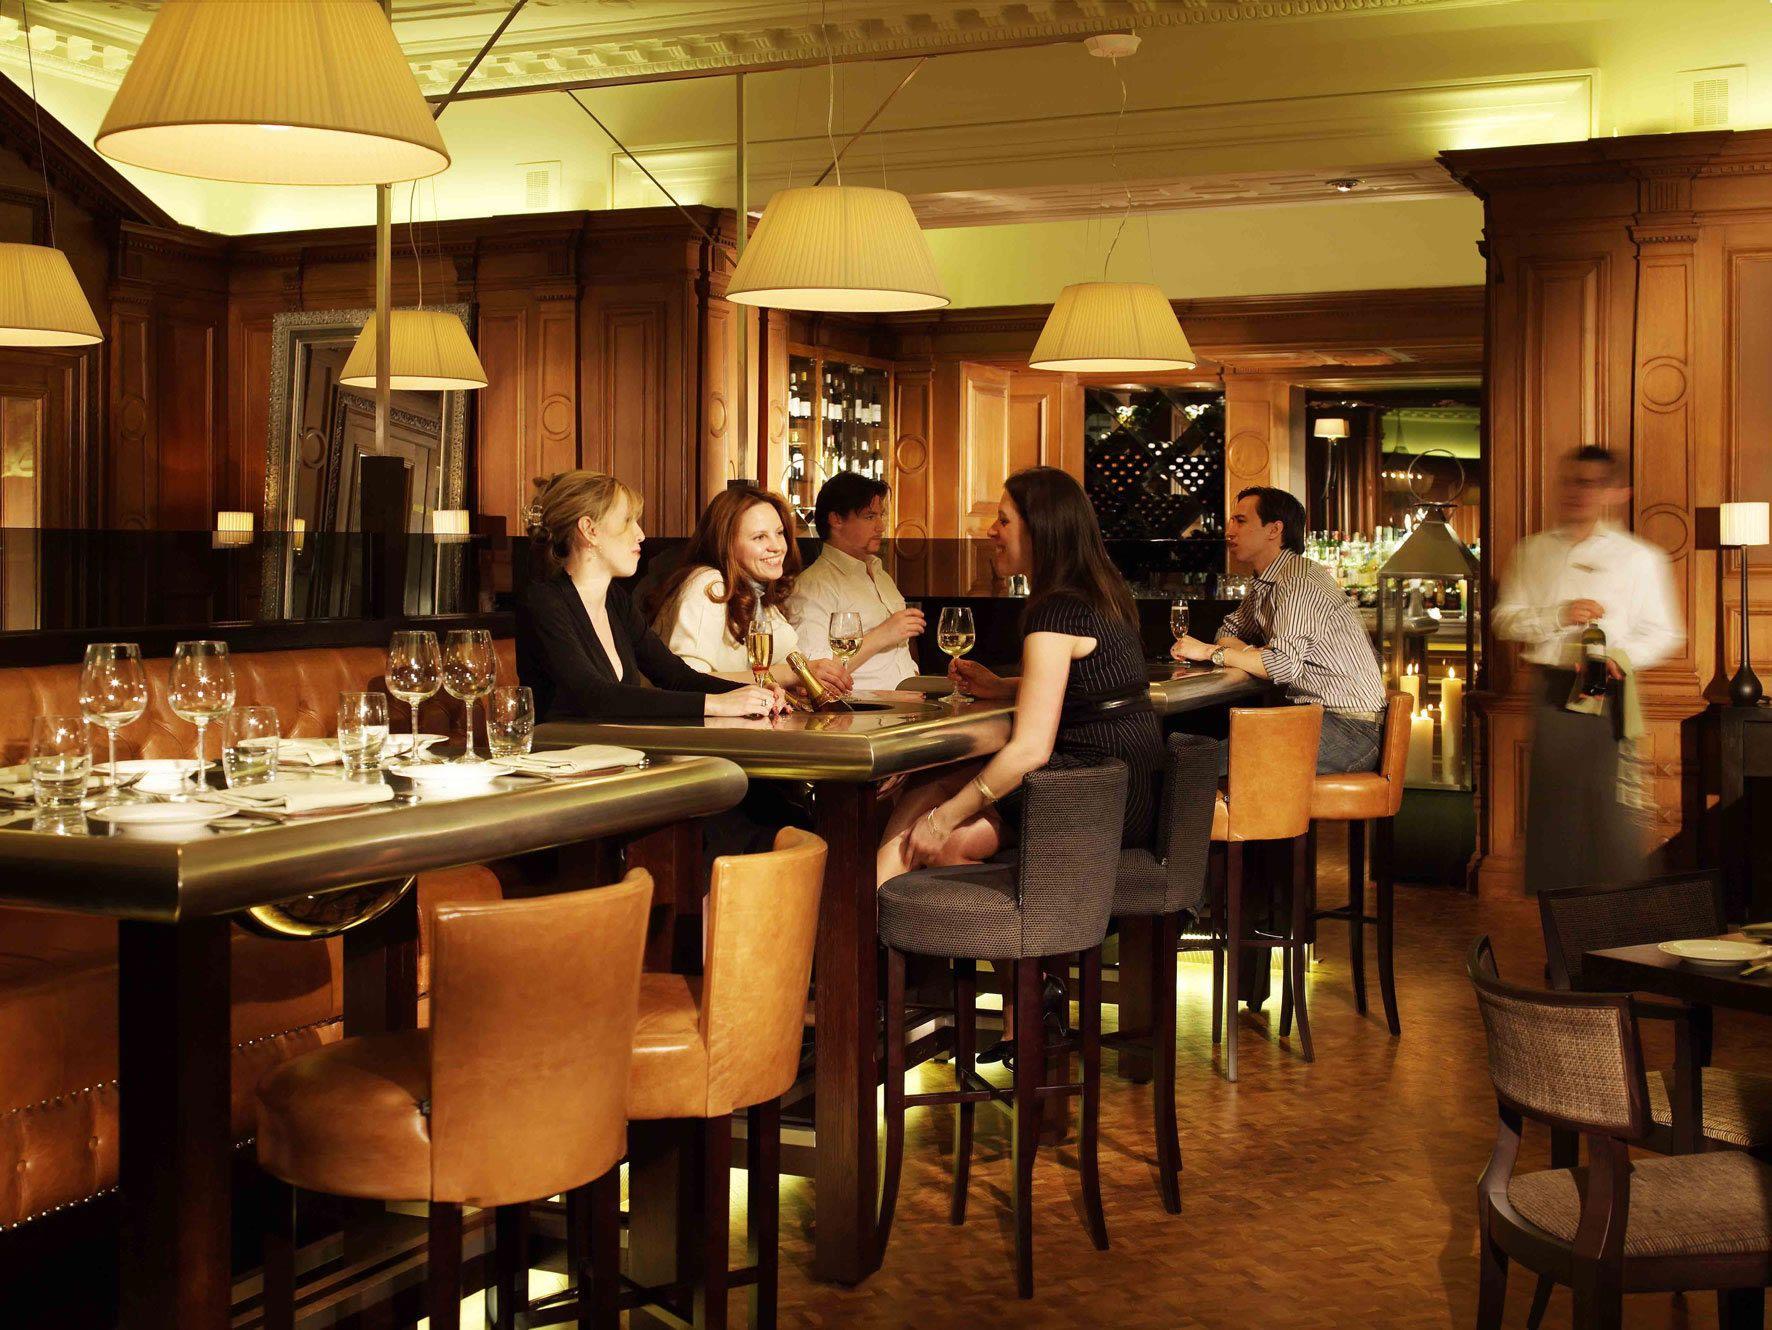 Restaurant Background With People landmark london restaurant | restaurant ideas | pinterest